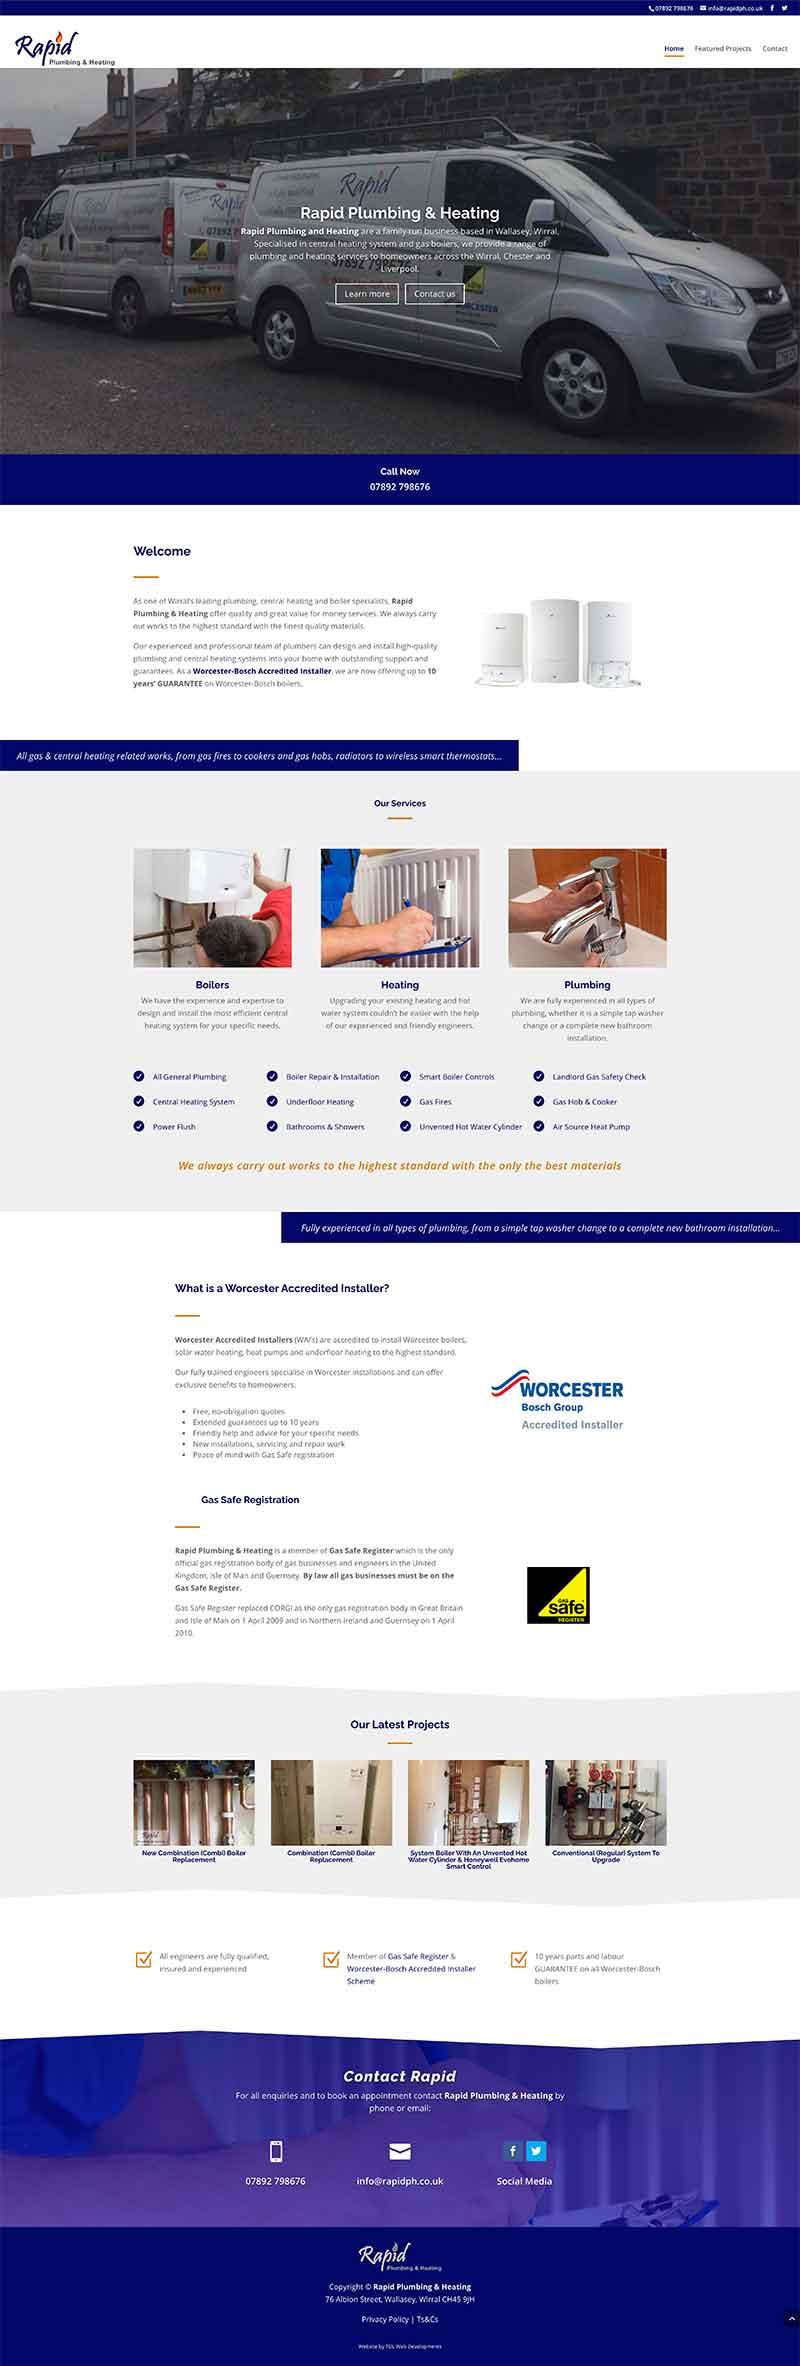 Full page screenshot of Rapid Plumbing & Heating website